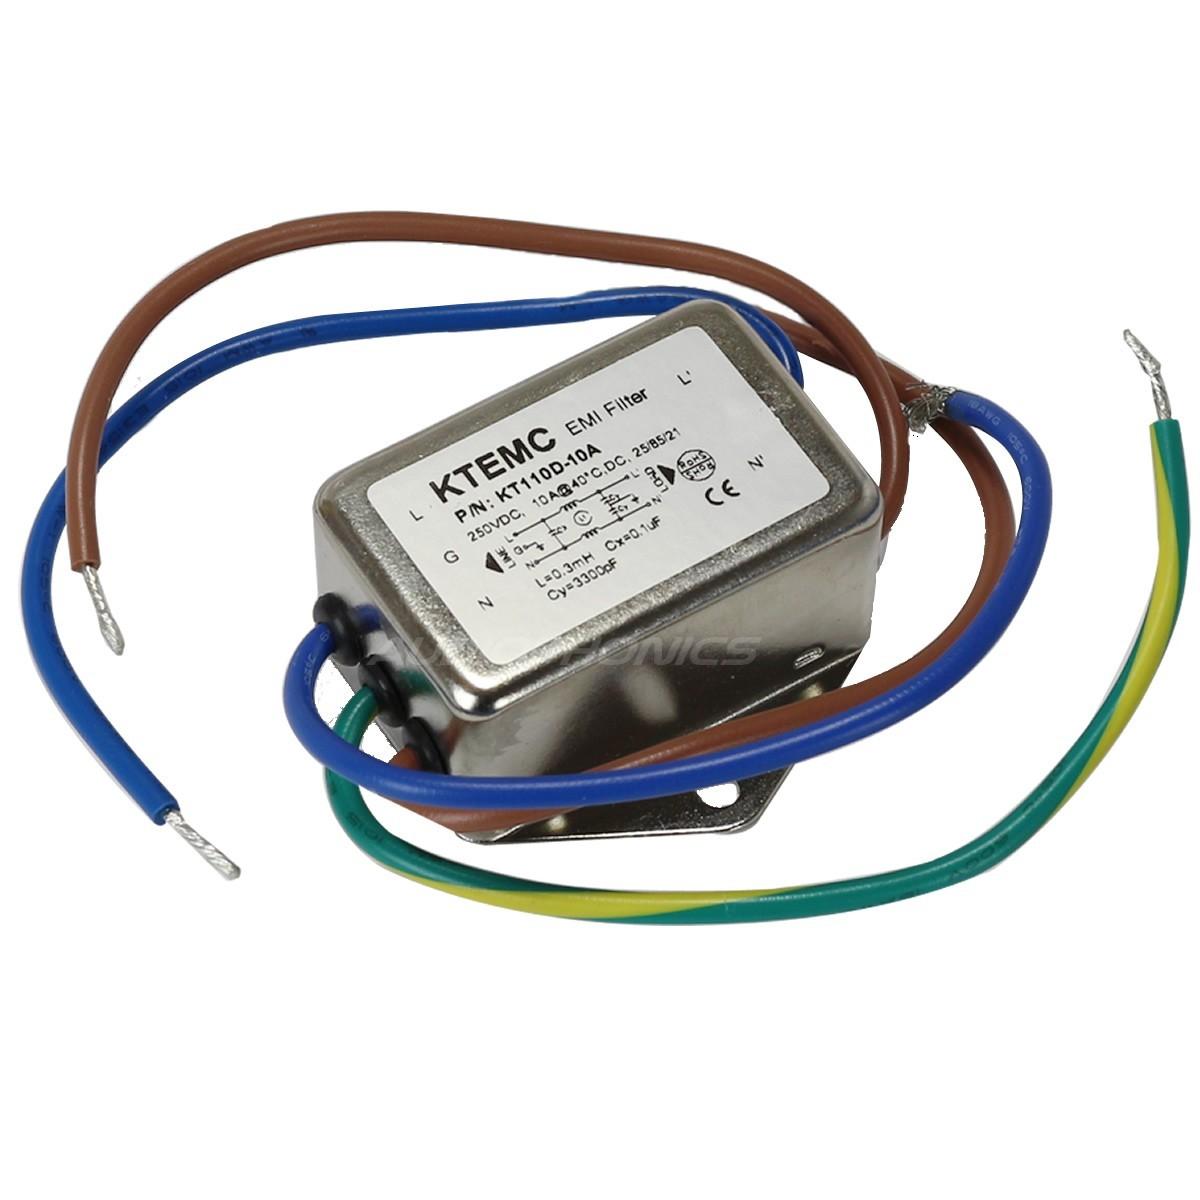 Filtre Secteur EMI / RFI 230V 10A avec Câbles